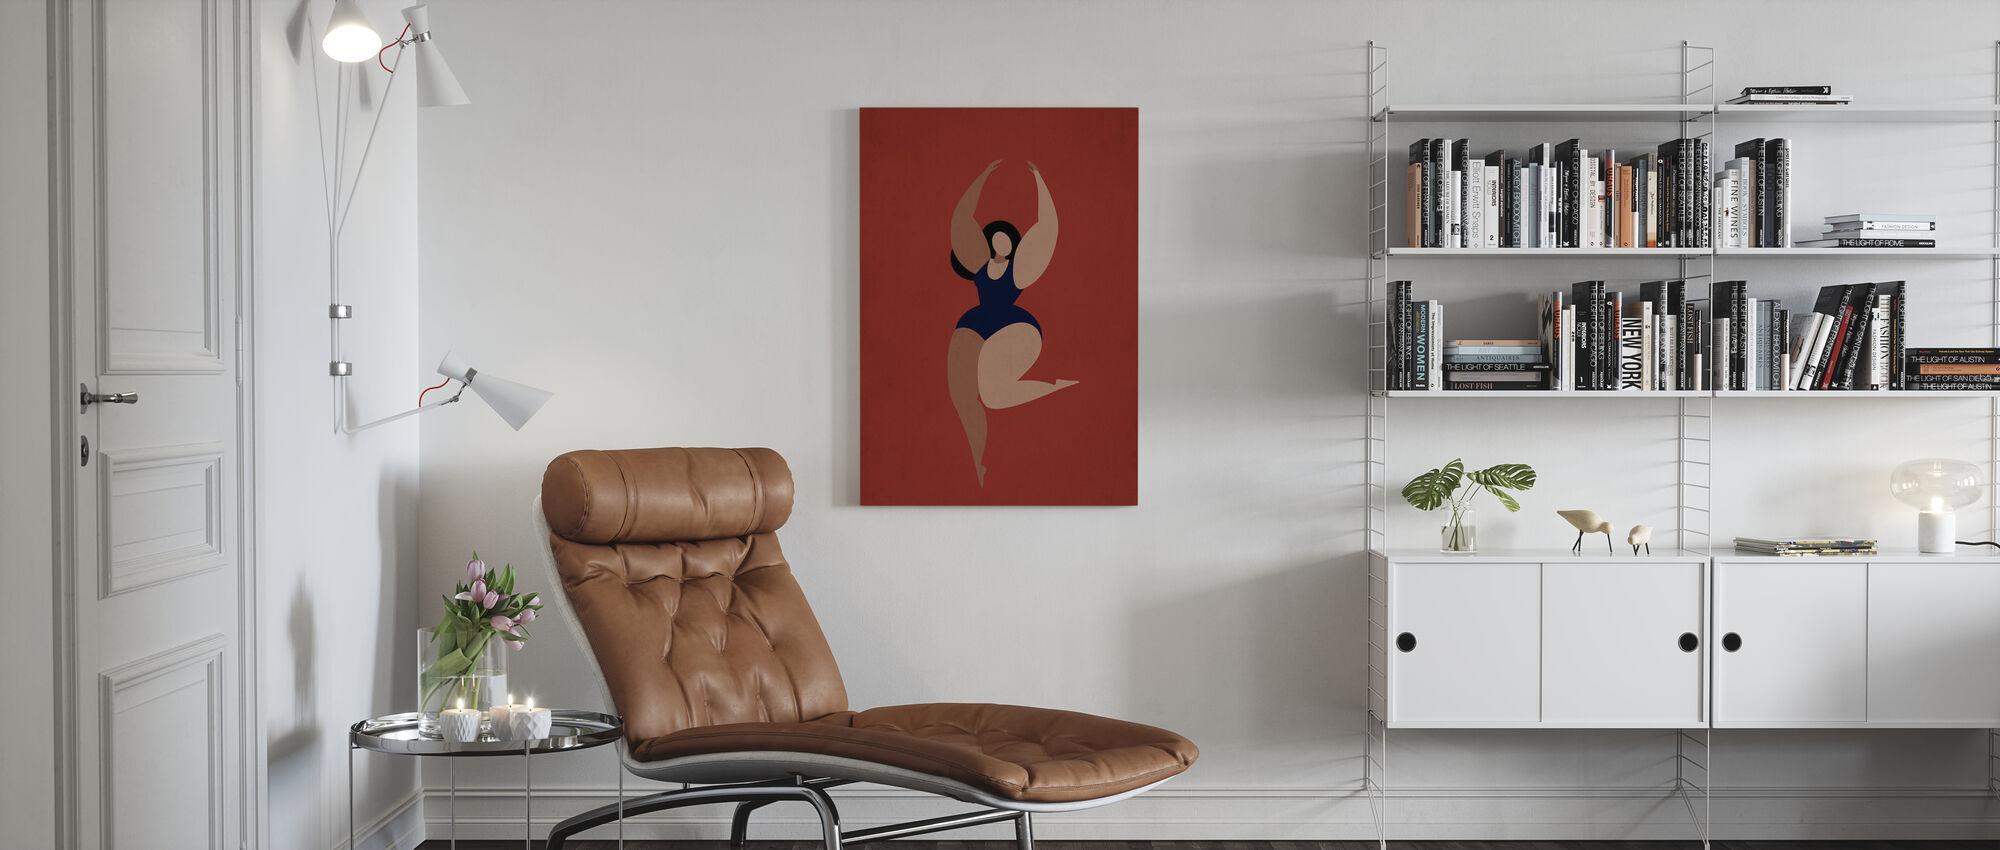 Prima Ballerina - Canvas print - Living Room